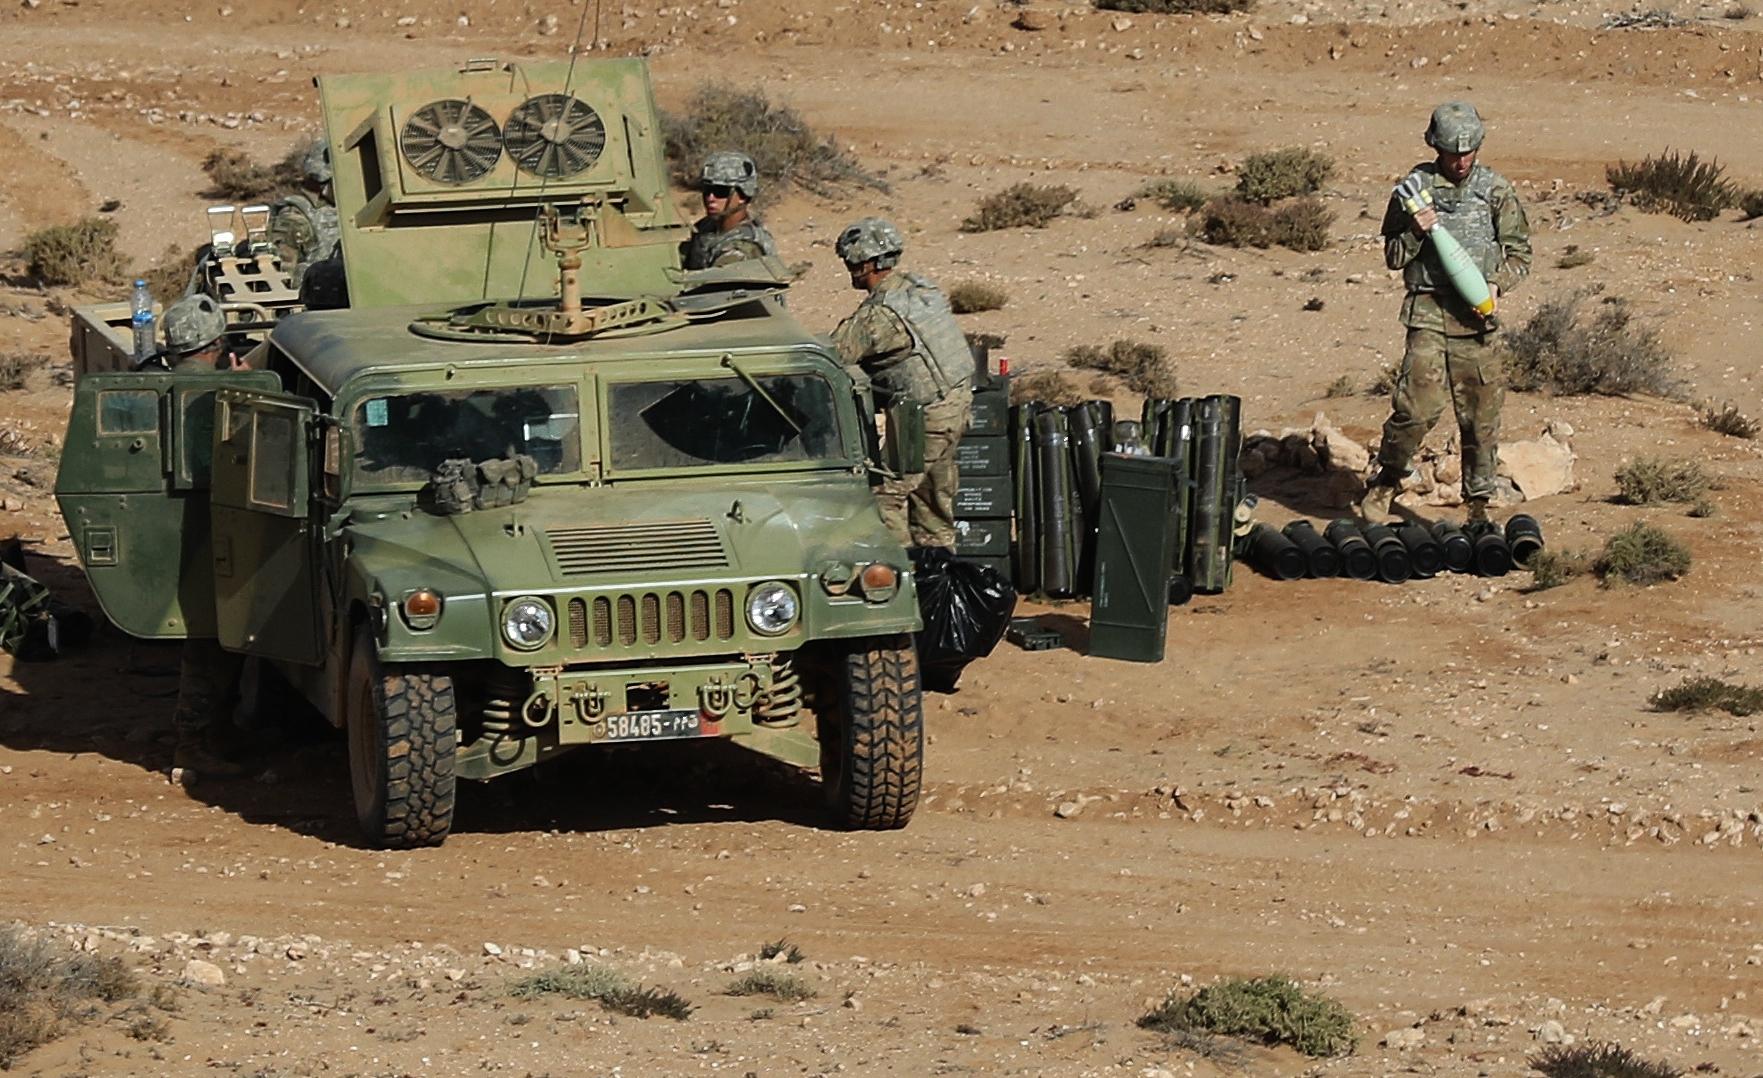 HMMWV et HMMWV Marine Armor Kit (MAK)  - Page 5 49250465582_e07222f80f_o